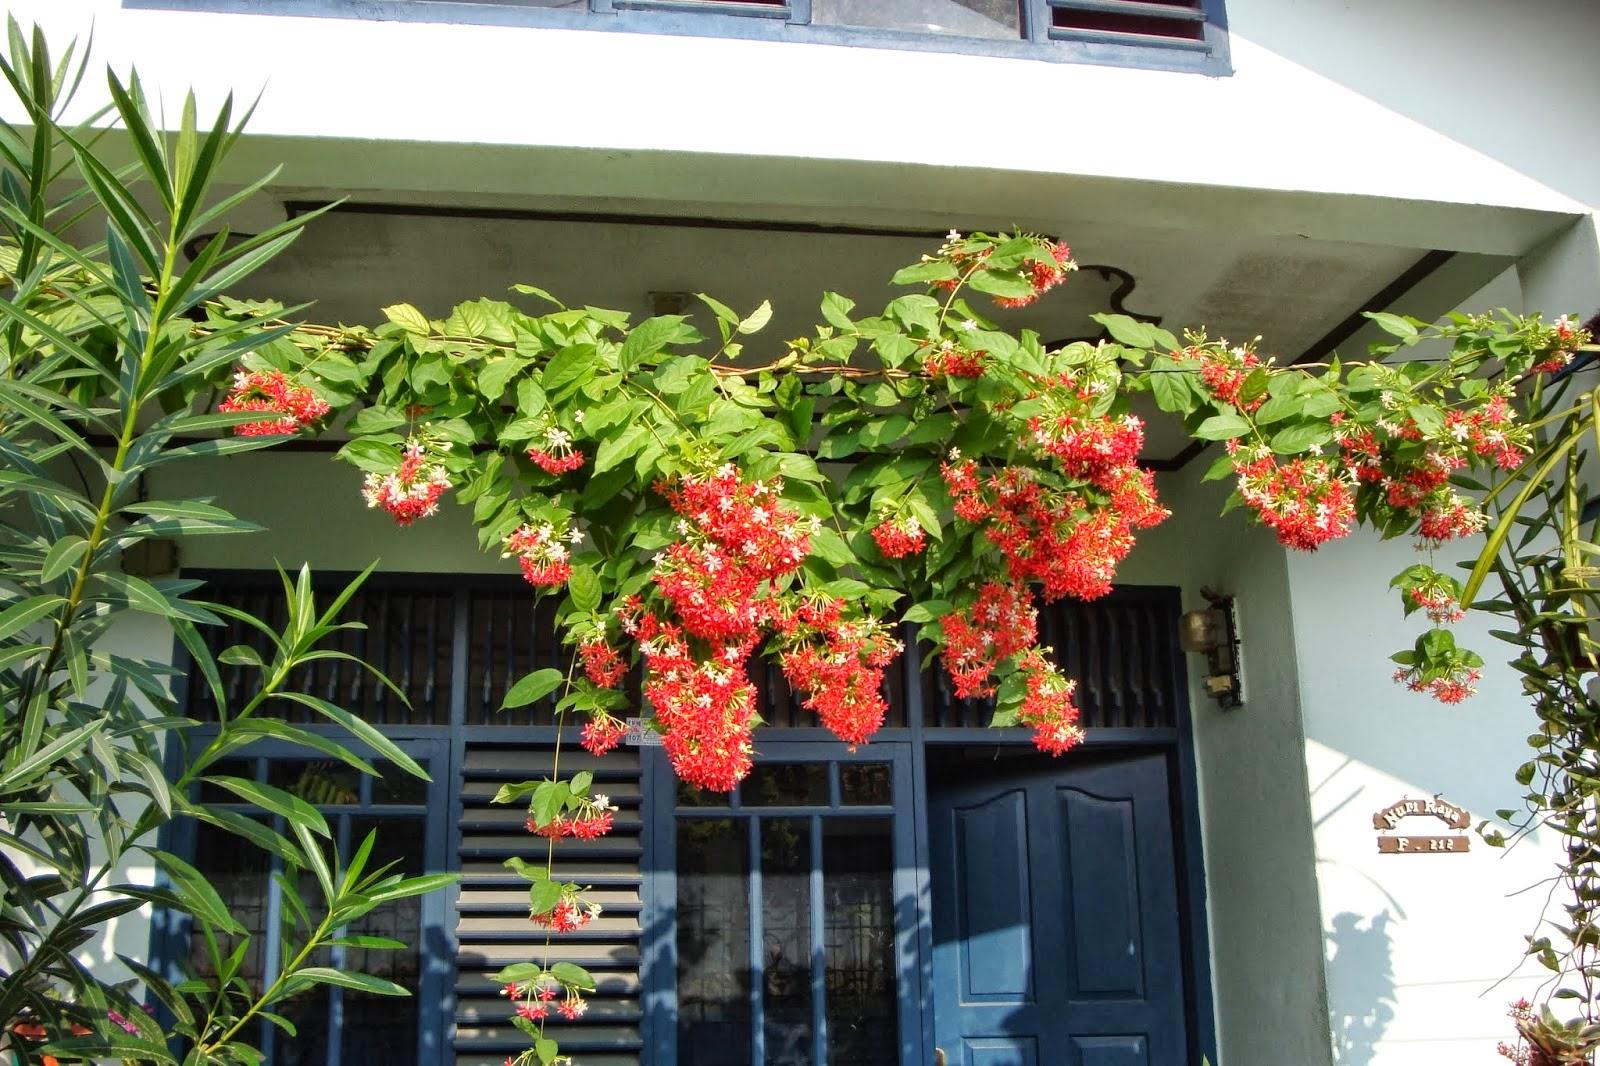 Jual pohon melati belanda | tanaman hias | jasa tukang taman